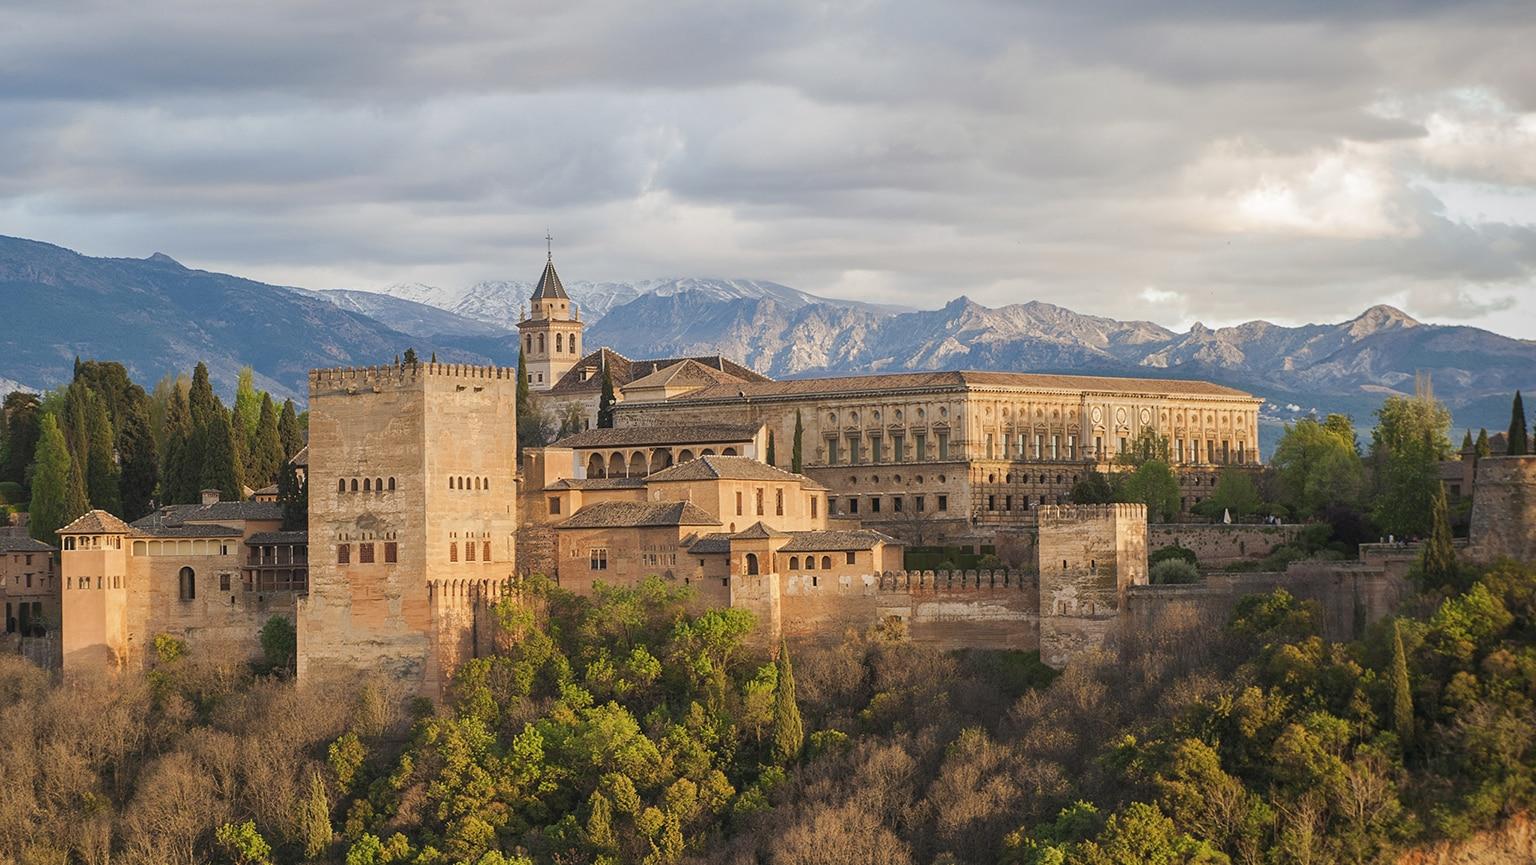 Al-Andalus—Islamic Spain